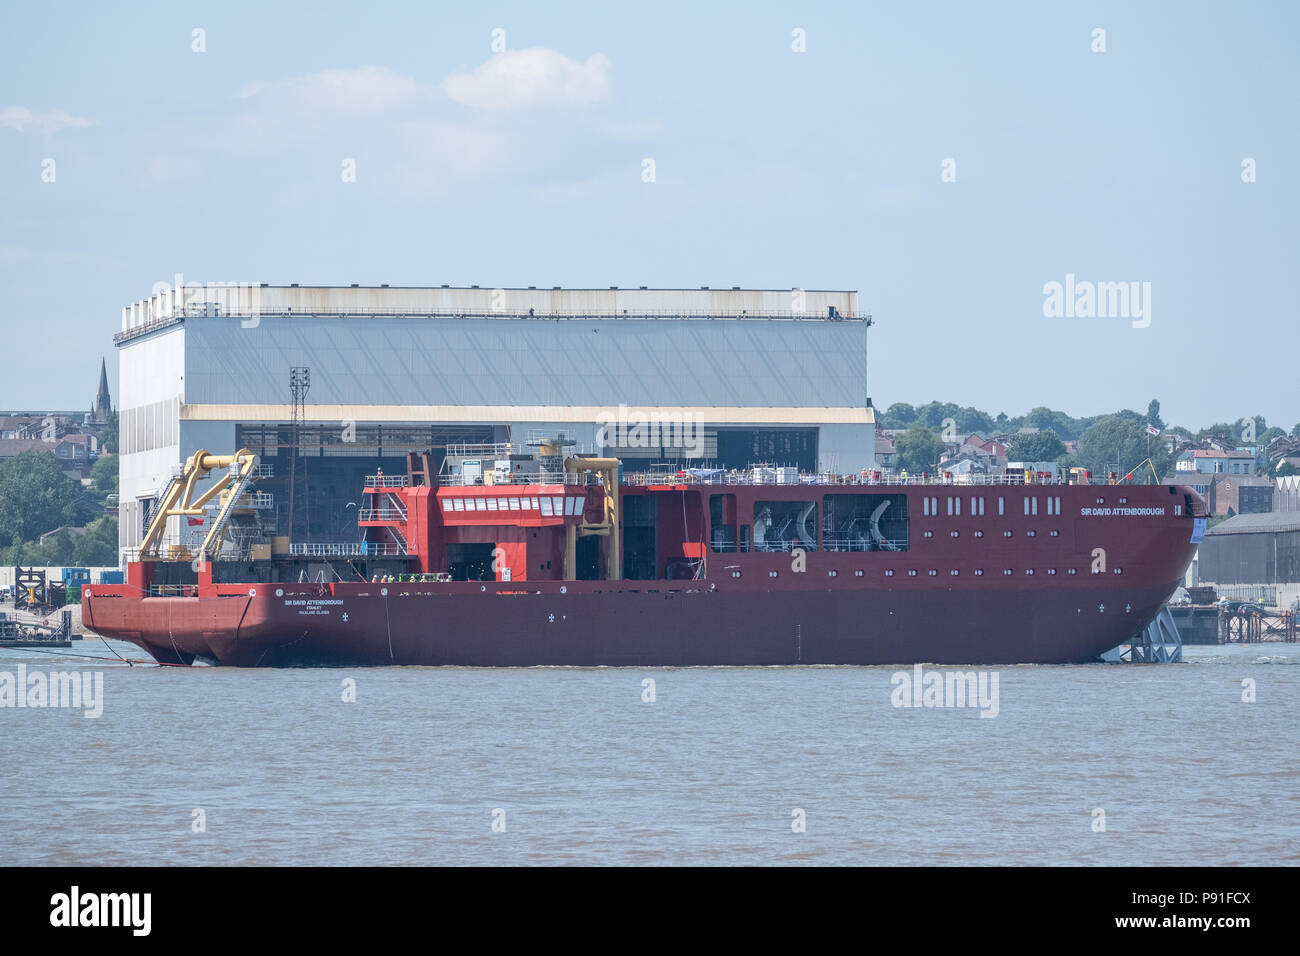 The new polar research ship, RRS Sir David Attenborough, the biggest